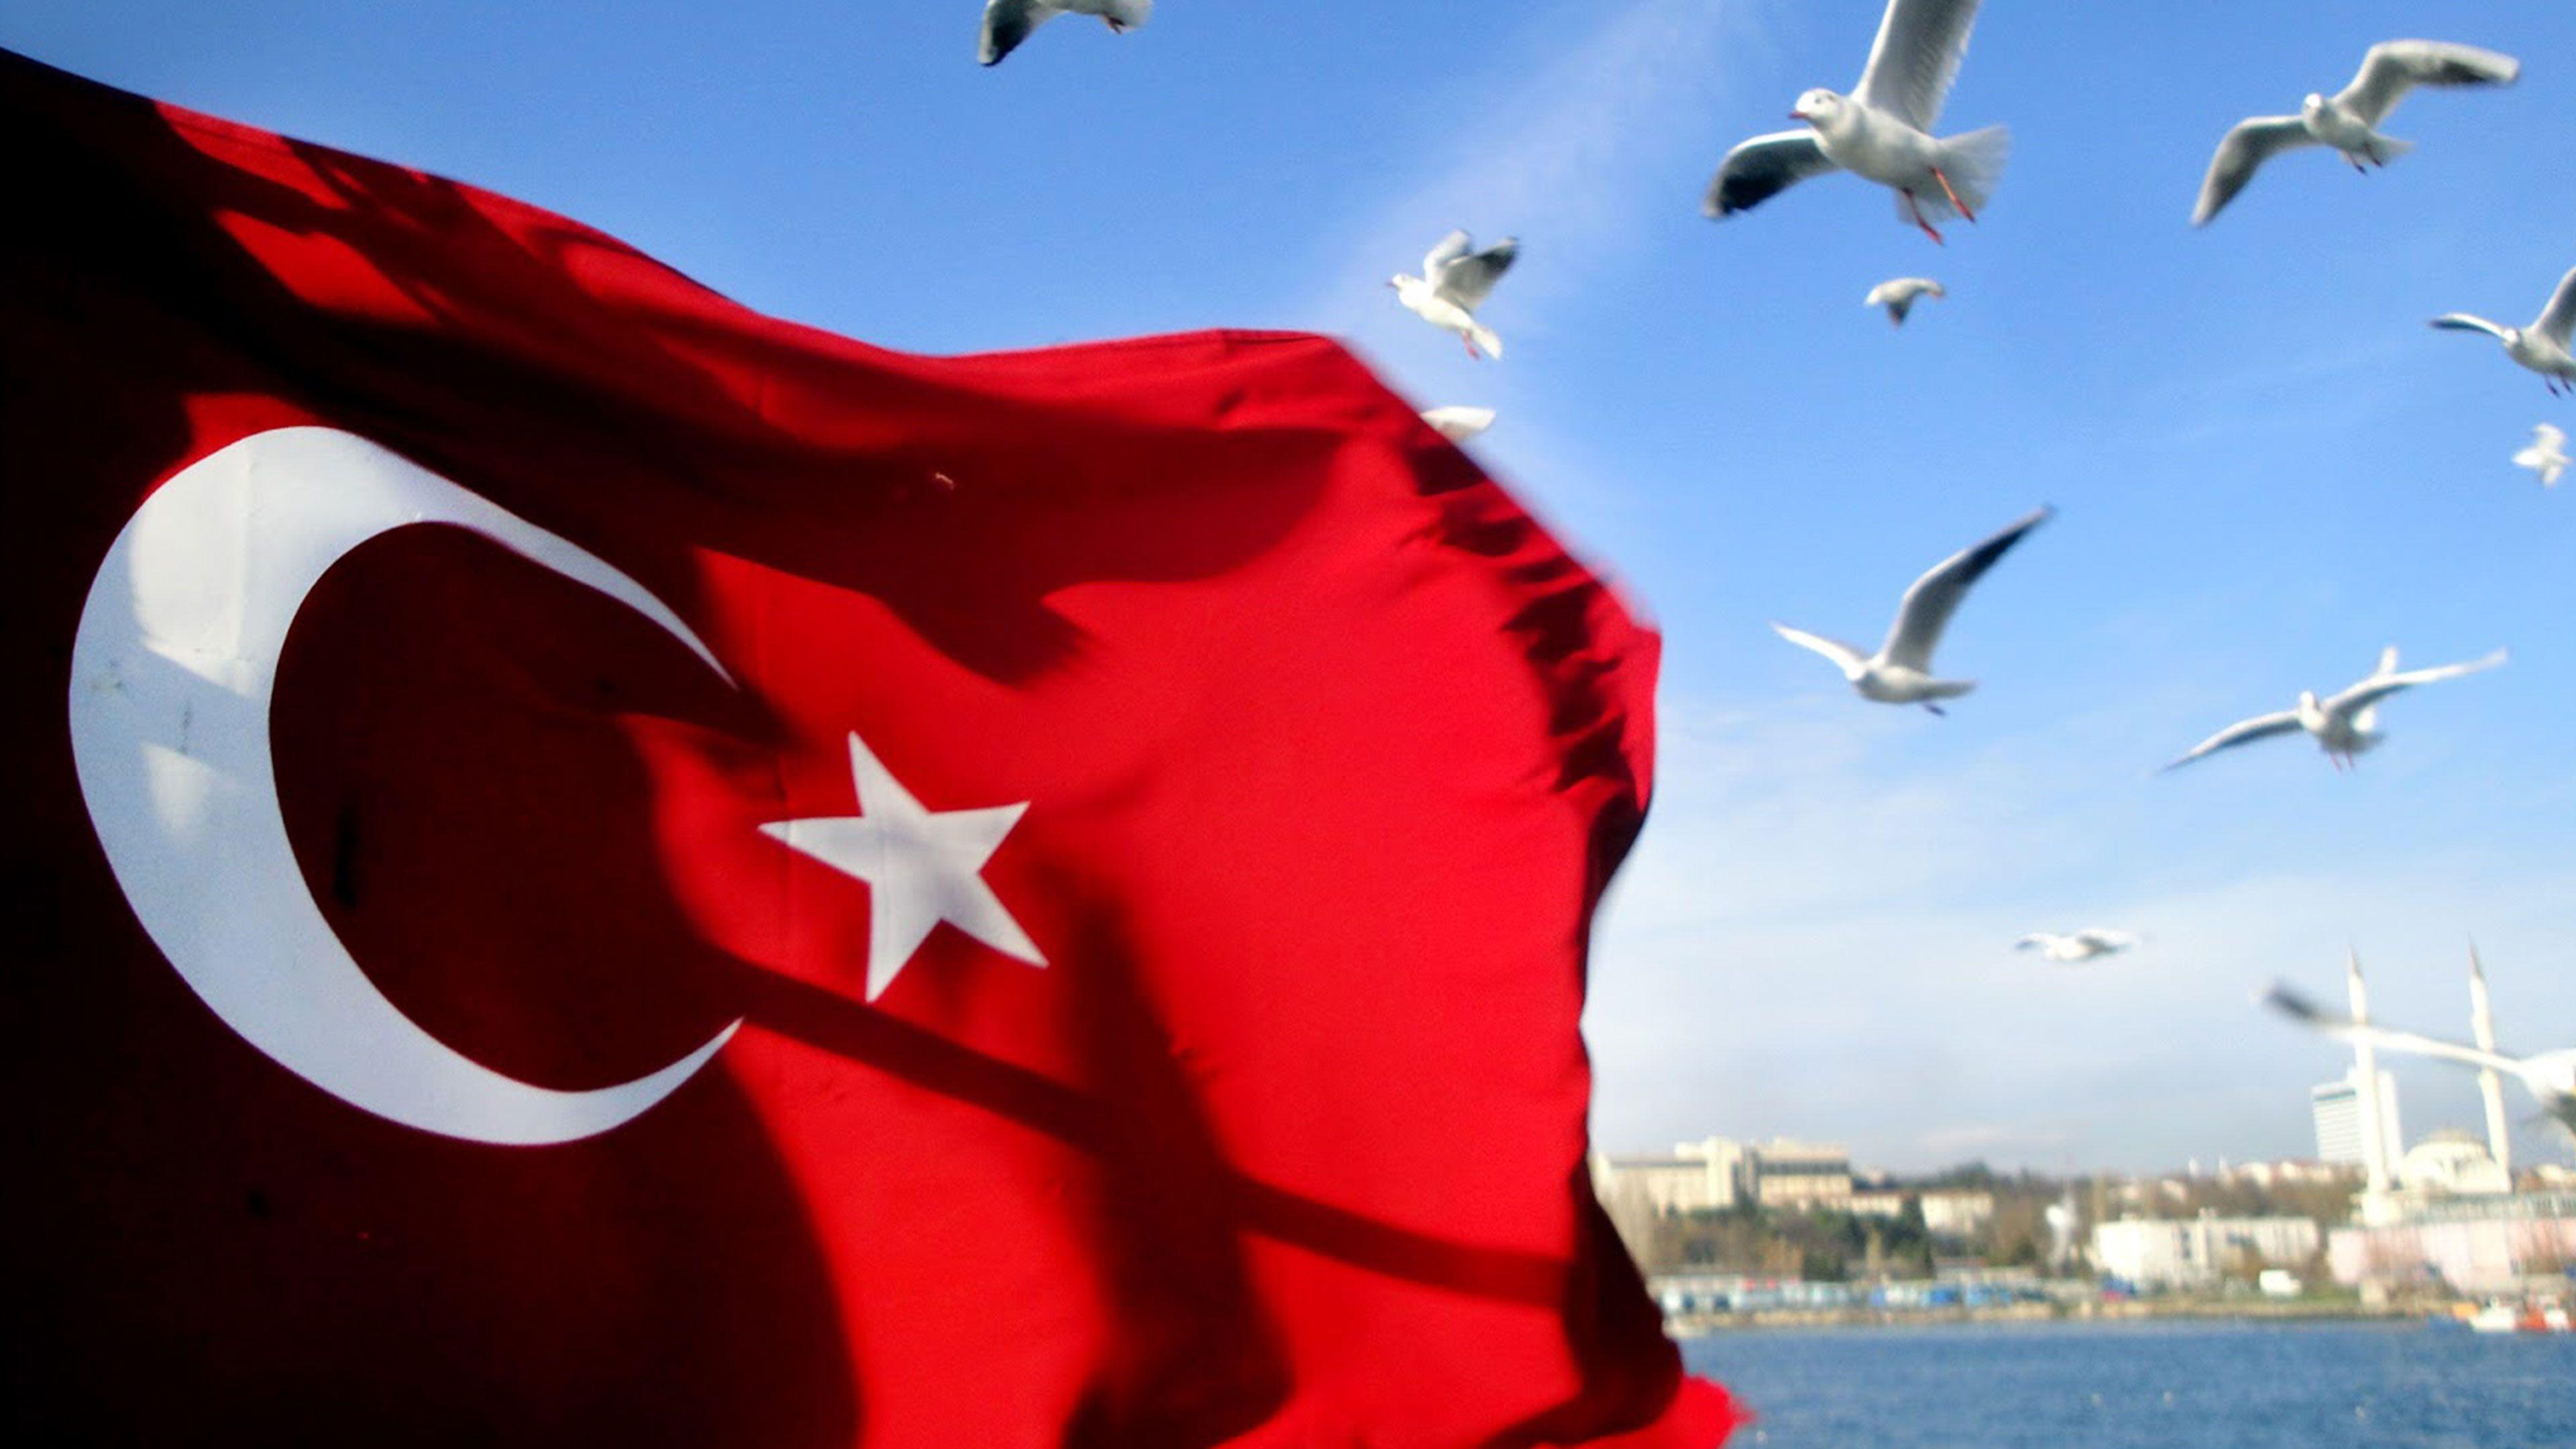 Türk Bayrağı 10k wallpapers